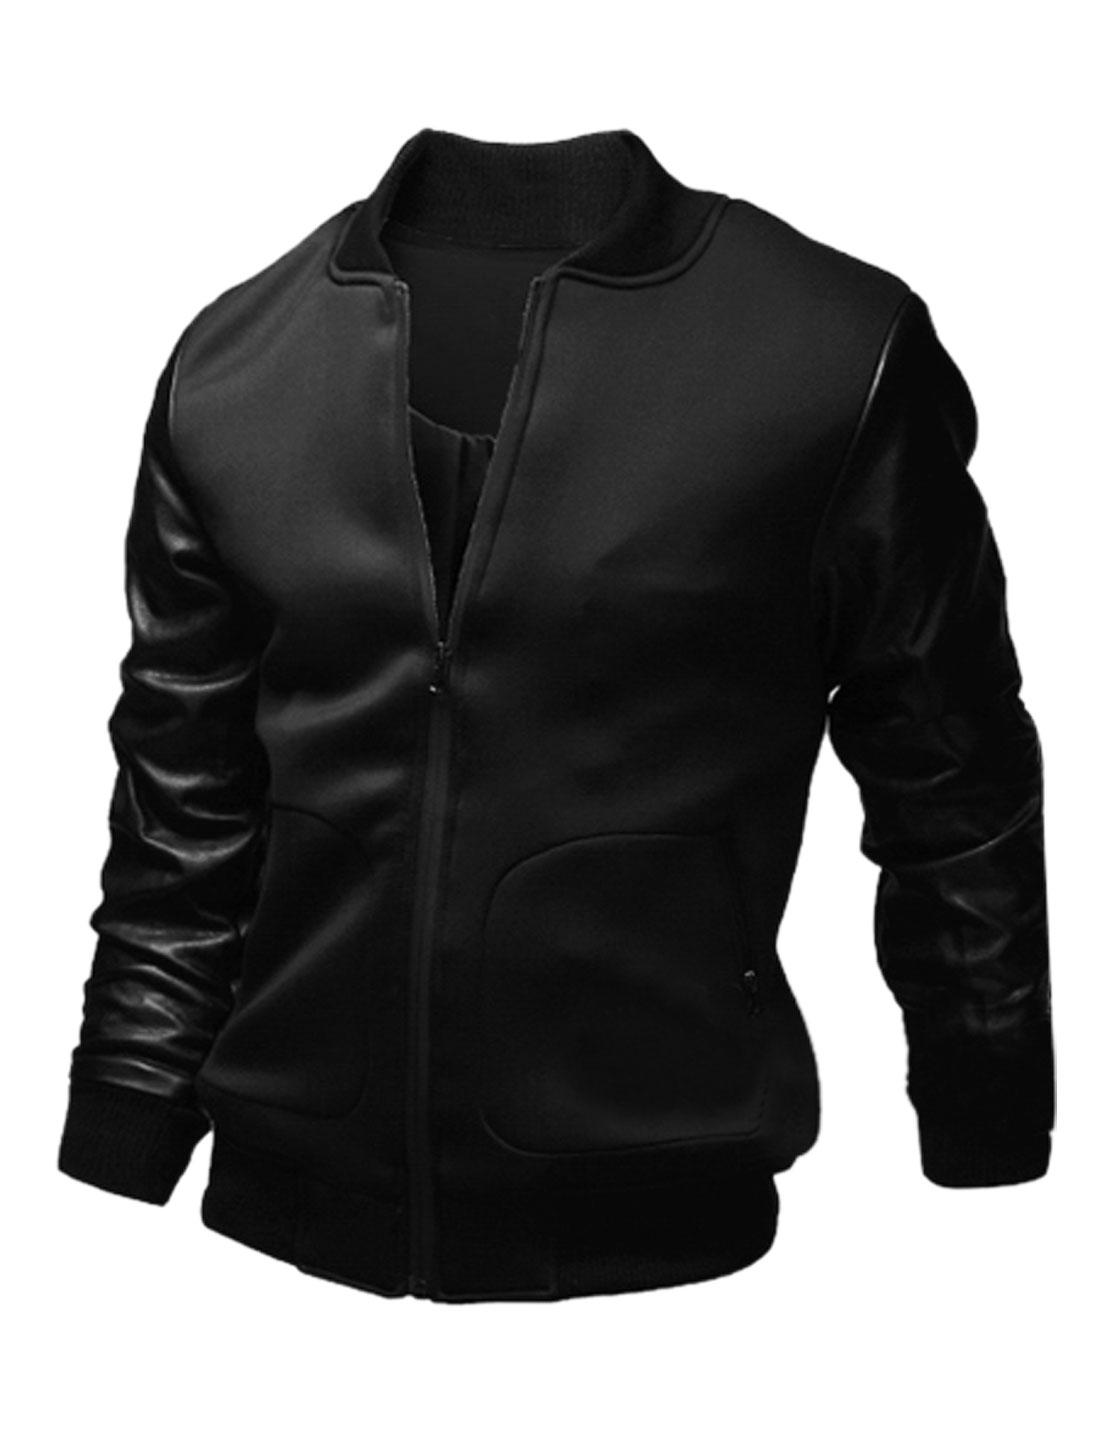 Men Imitation Leather Panel Stand Collar Ribbed Trim Jacket Black